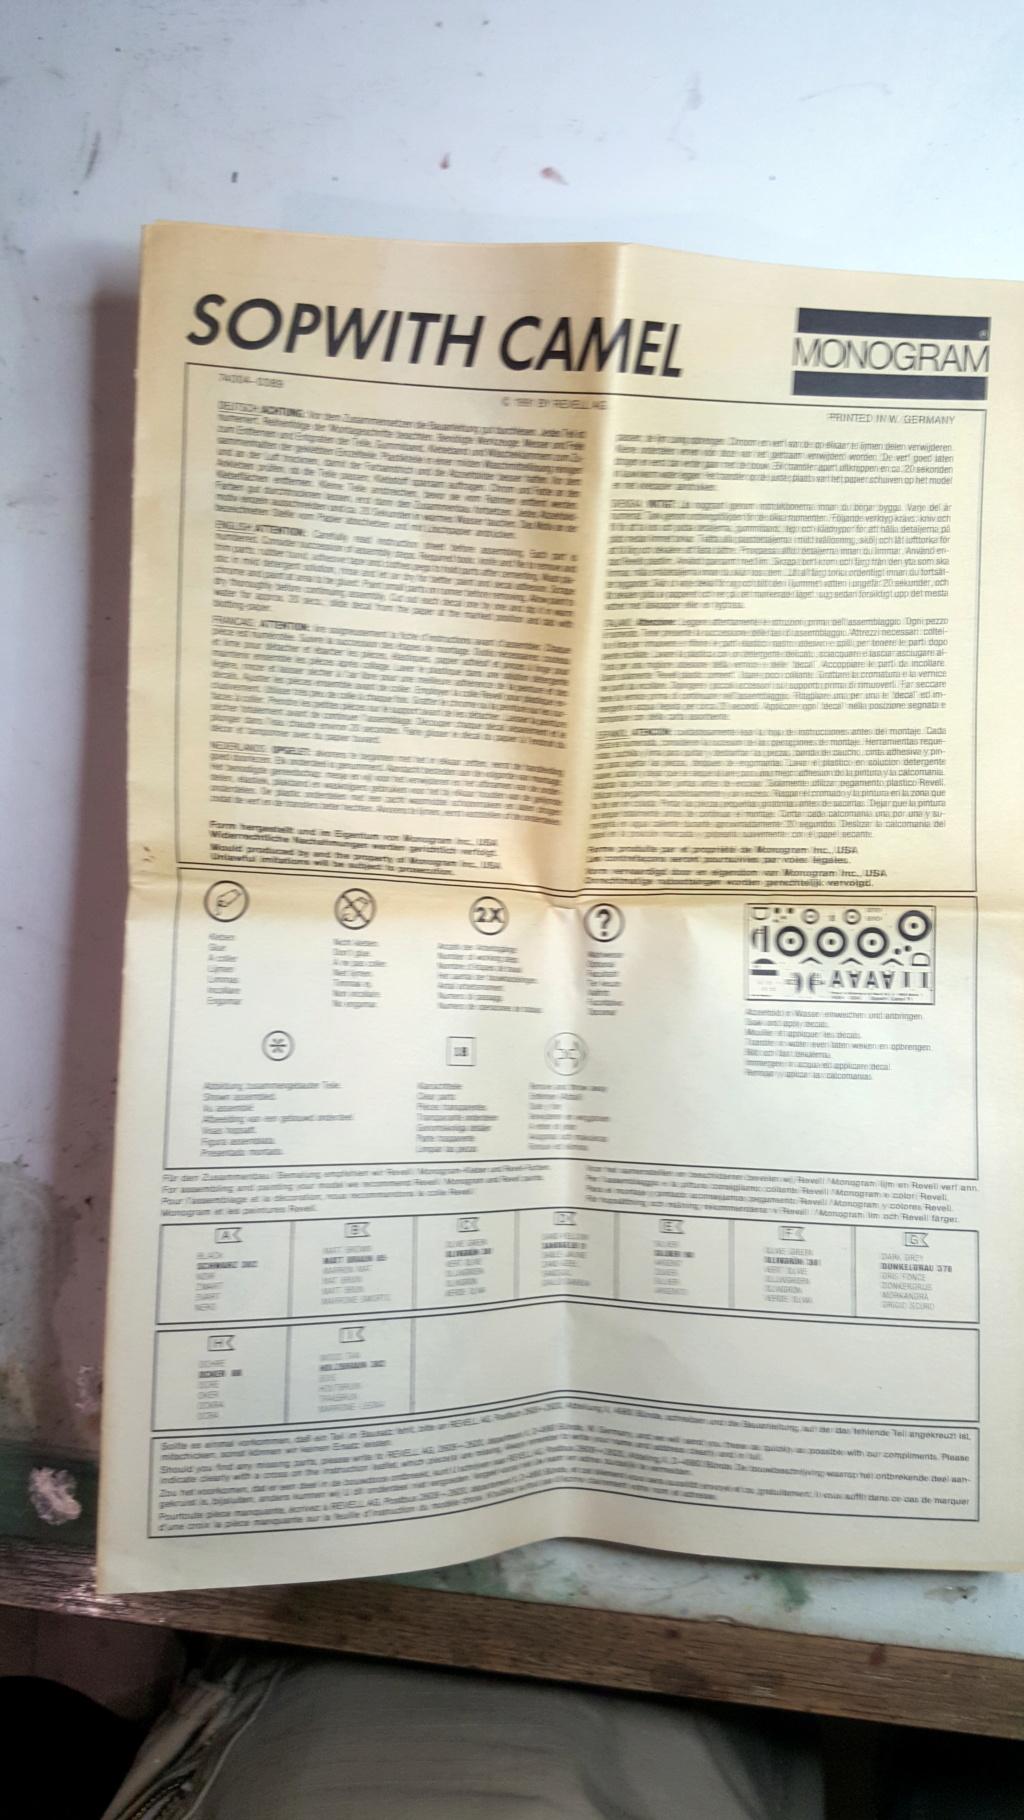 Sopwith Camel - Remise à niveau kit Aurora/Monogram (1975) - 1/48 20181238